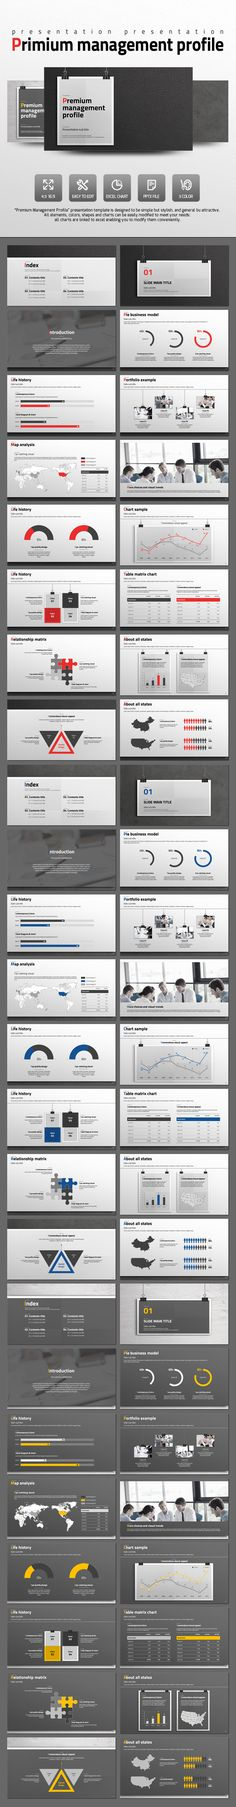 Premium Management Profile PowerPoint Template #design #slides Download: http://graphicriver.net/item/premium-management-profile/14044573?ref=ksioks